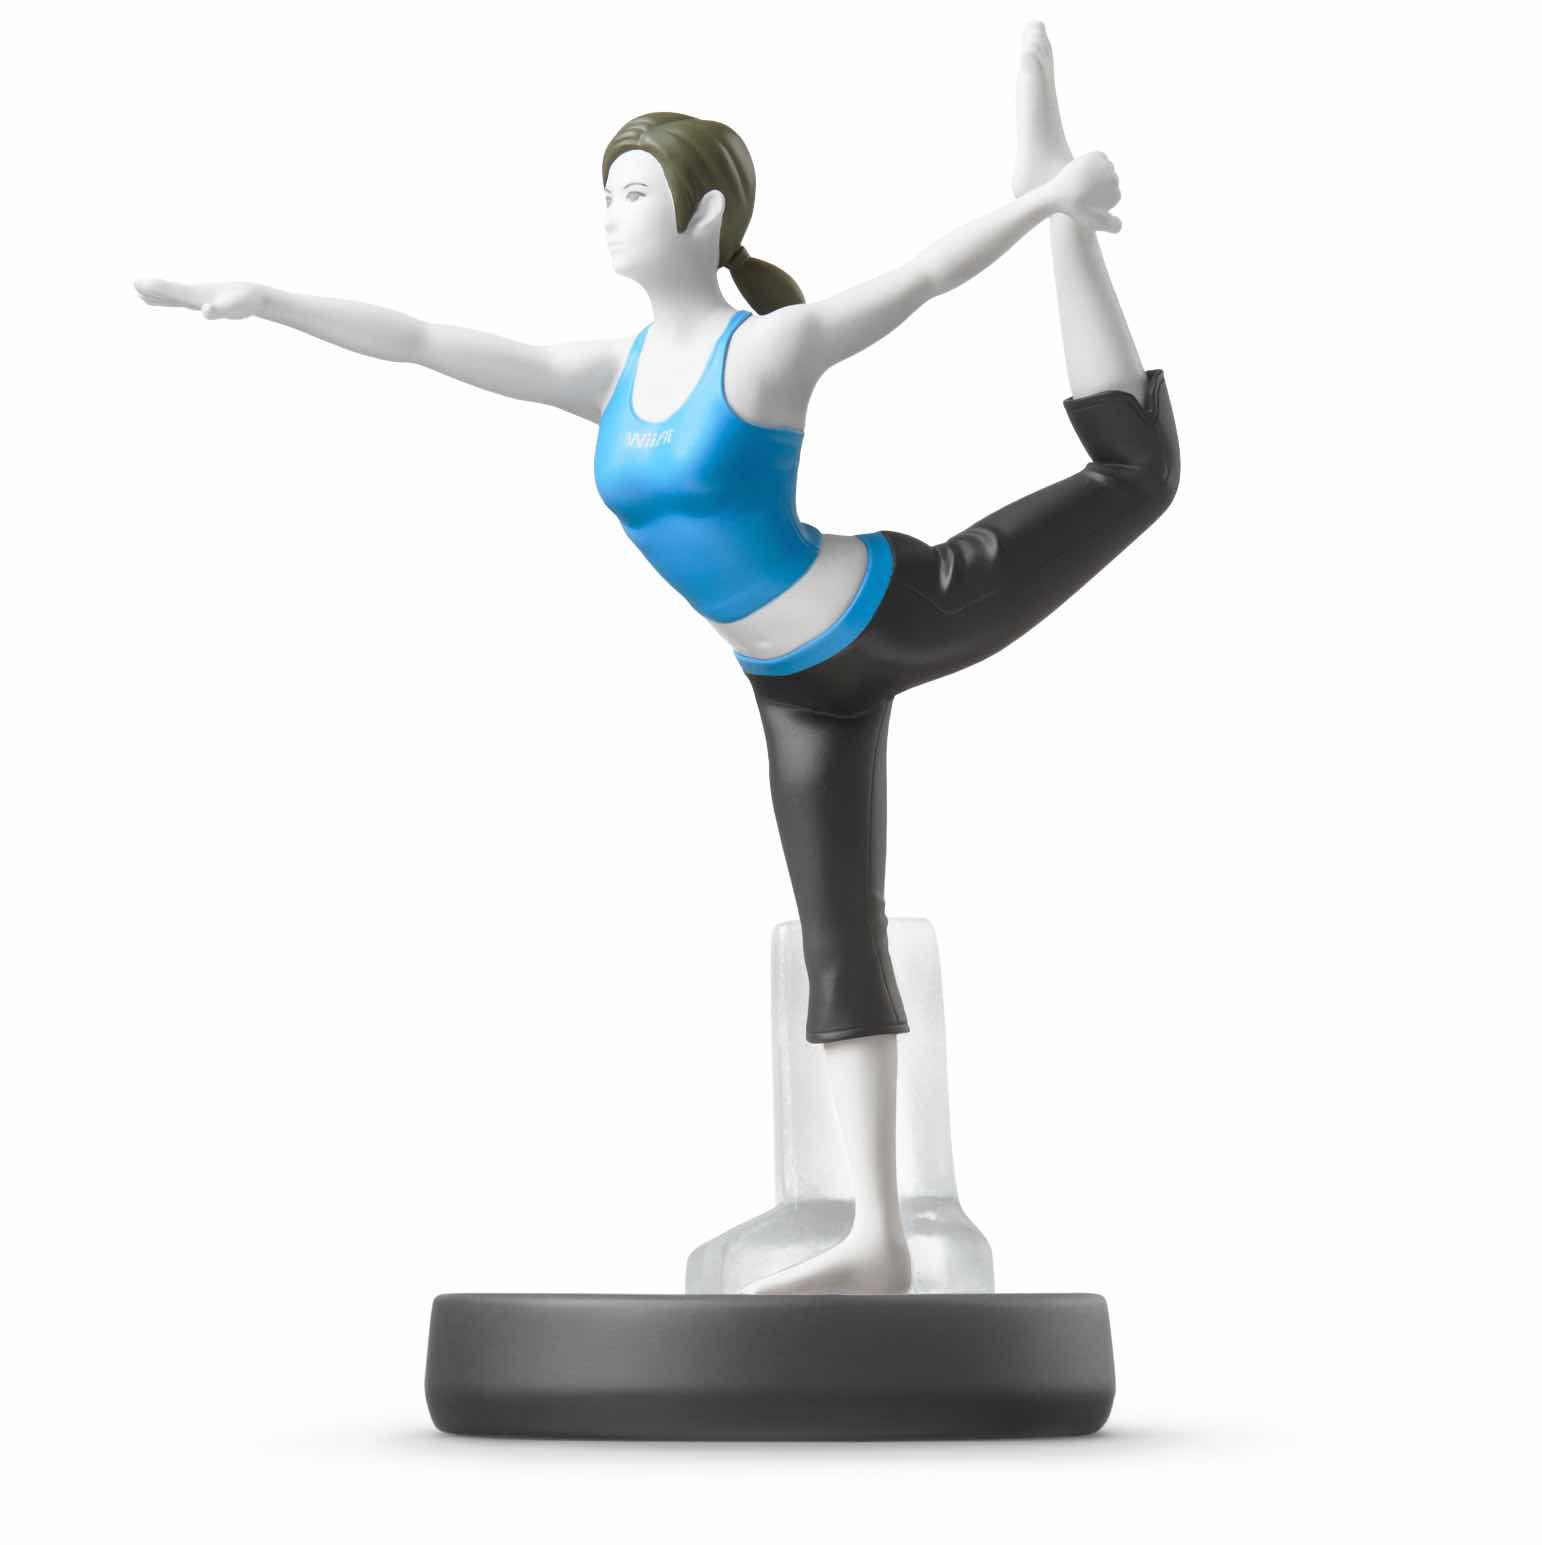 wii-fit-trainer-amiibo-figure